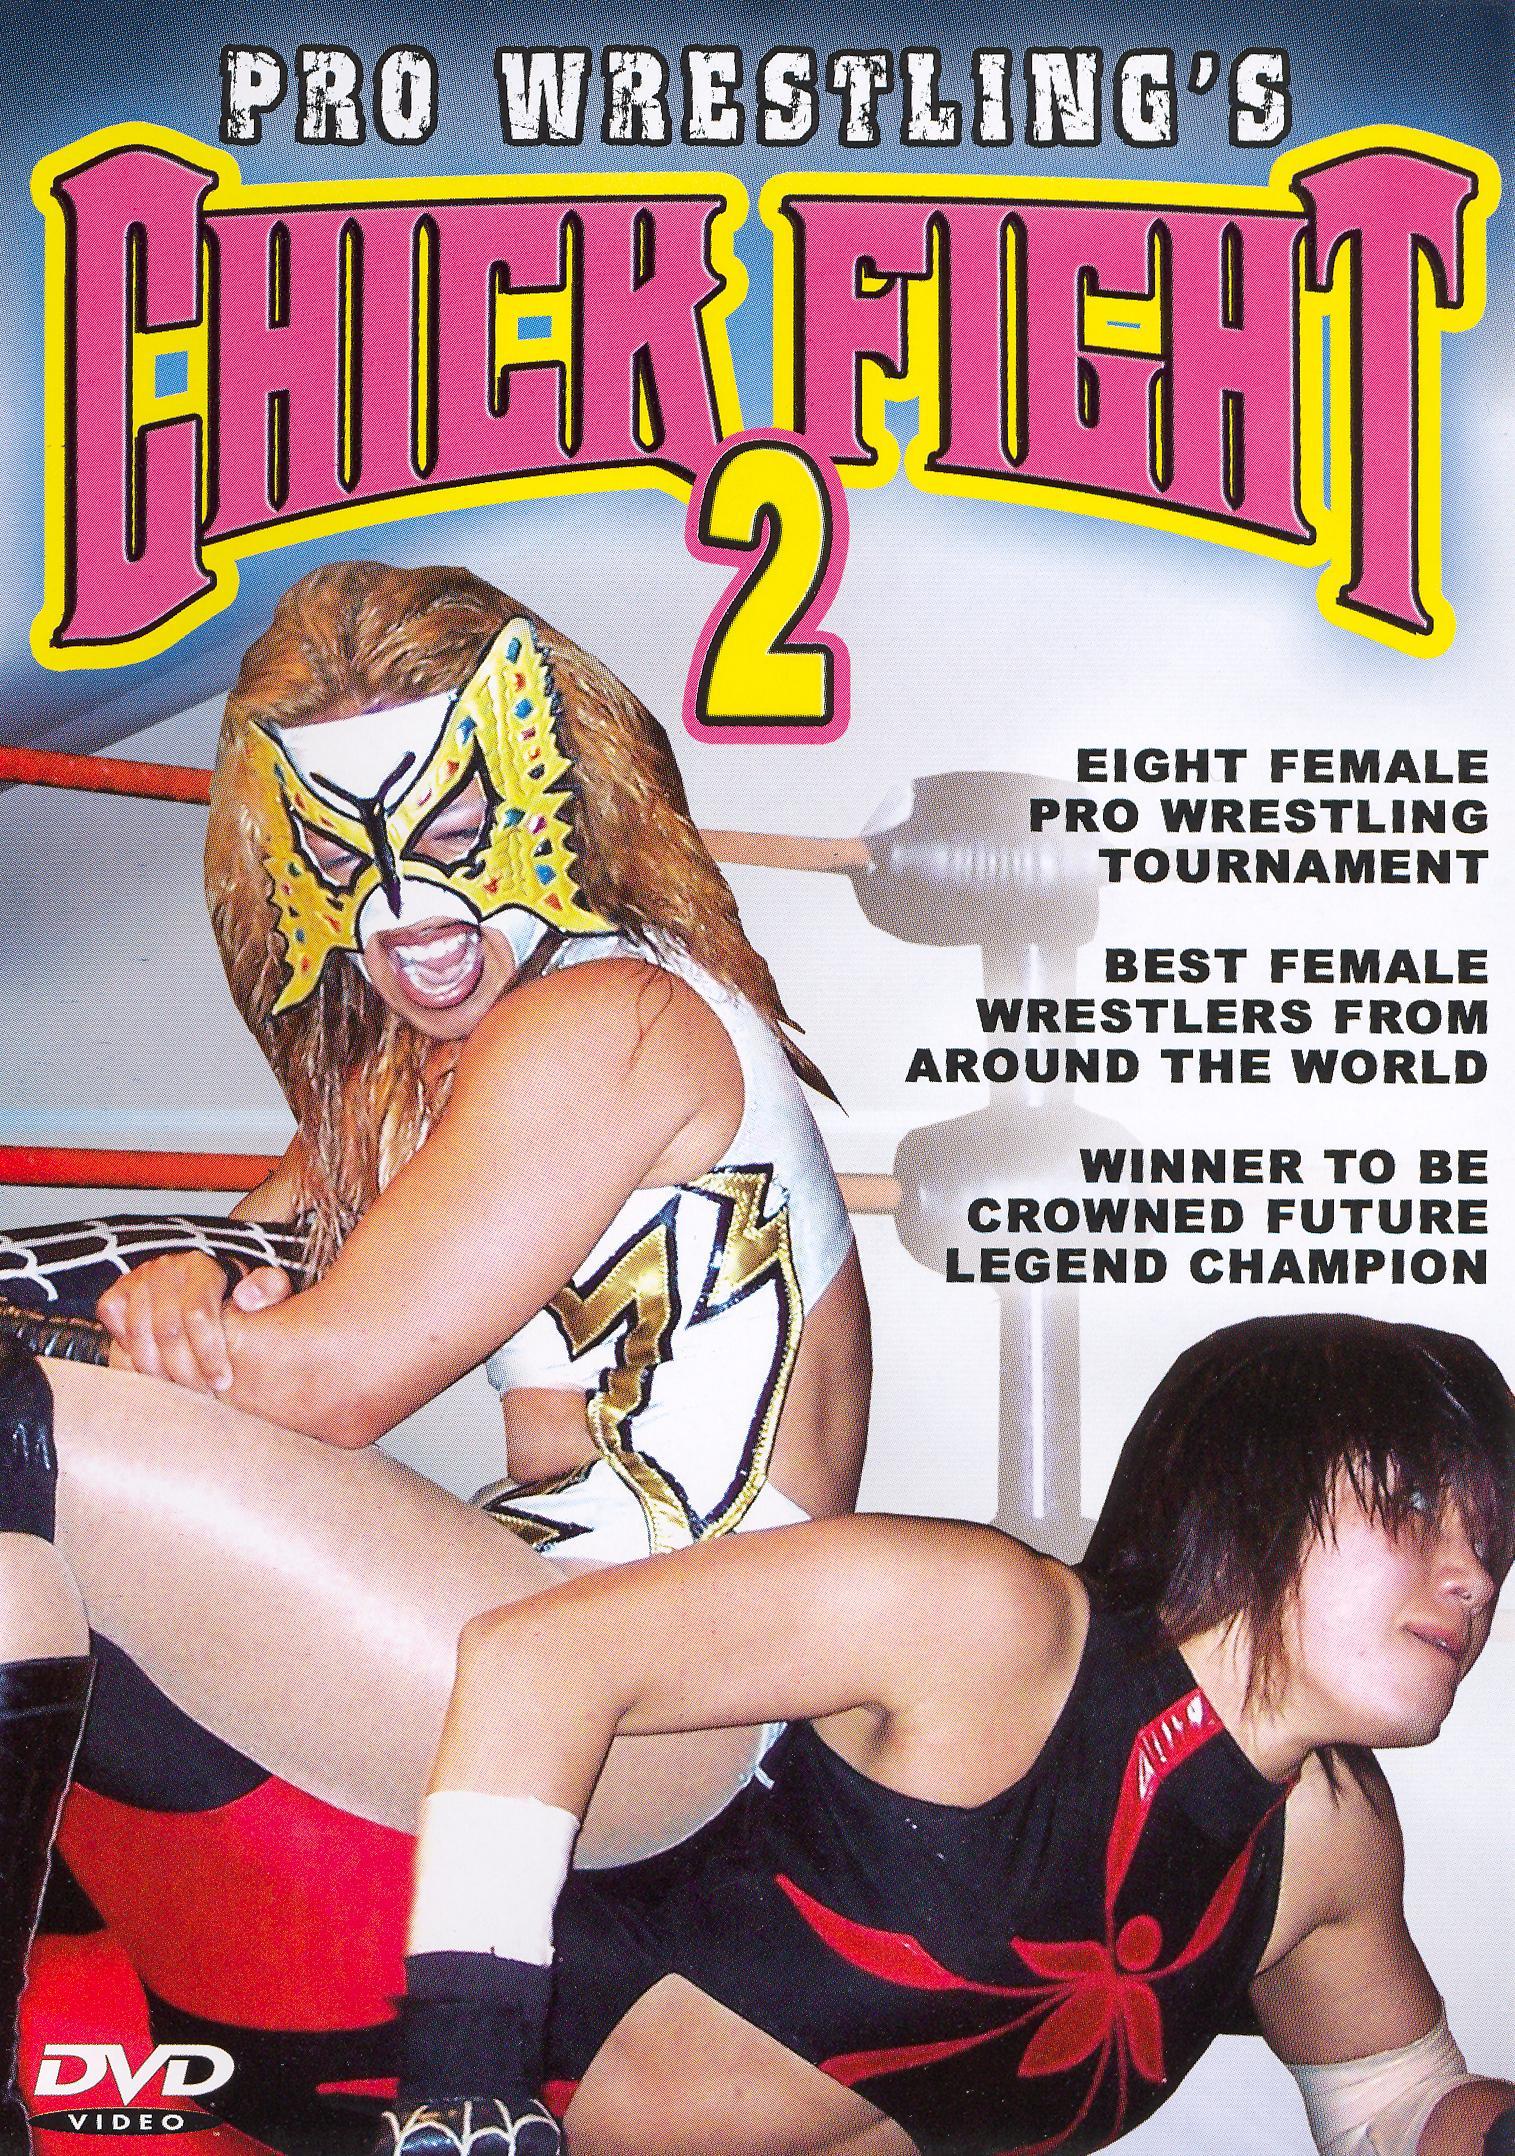 Pro Wrestling's Chick Fight, Vol. 2